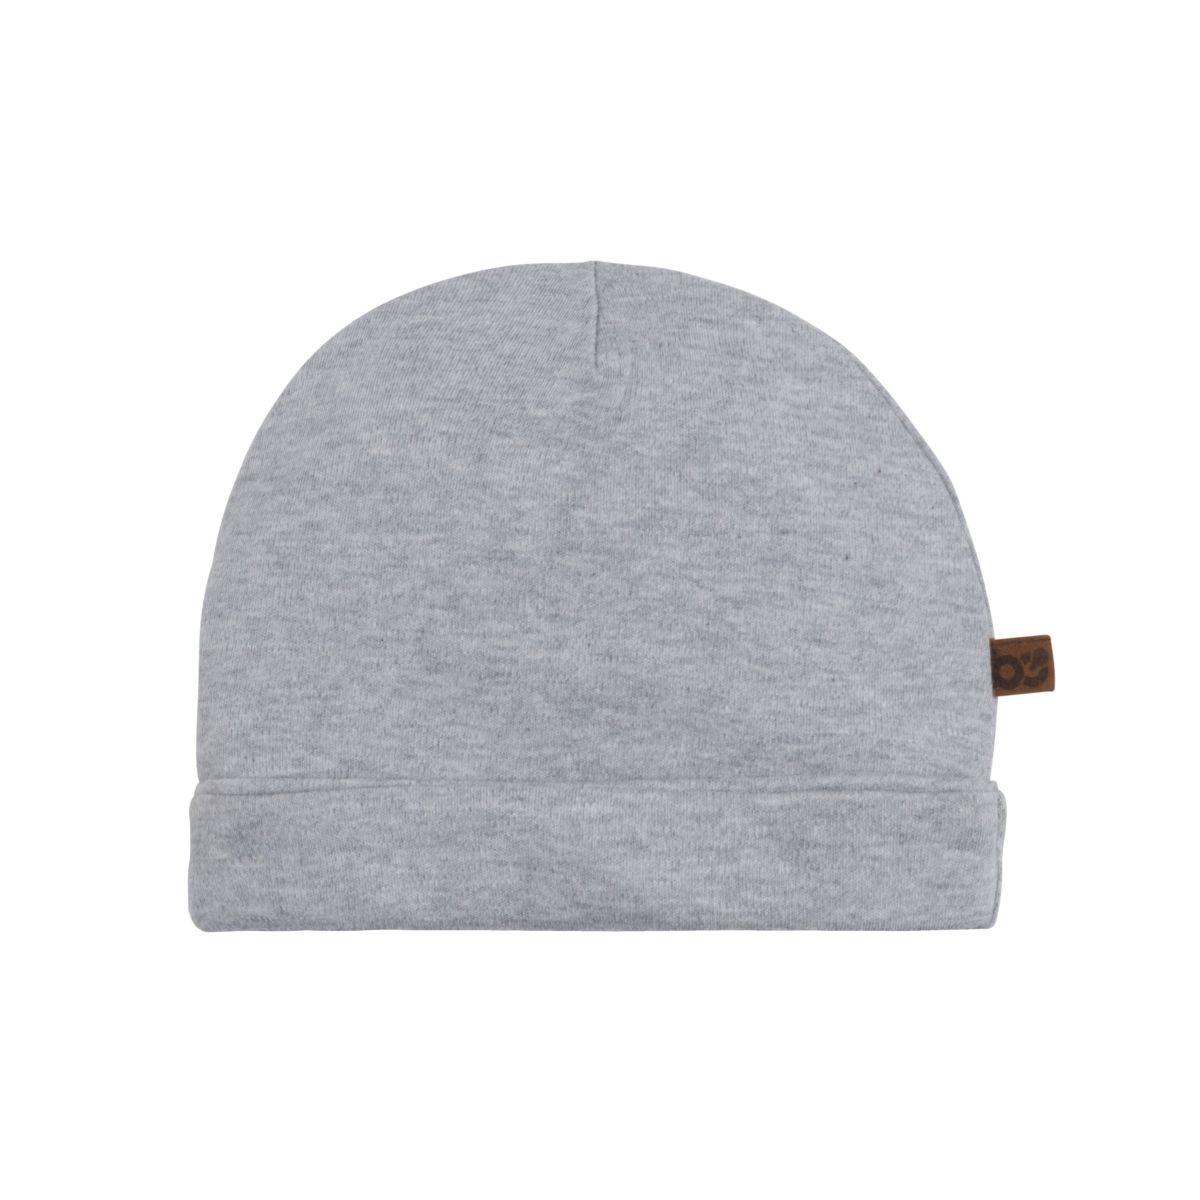 hat melange grey 03 months